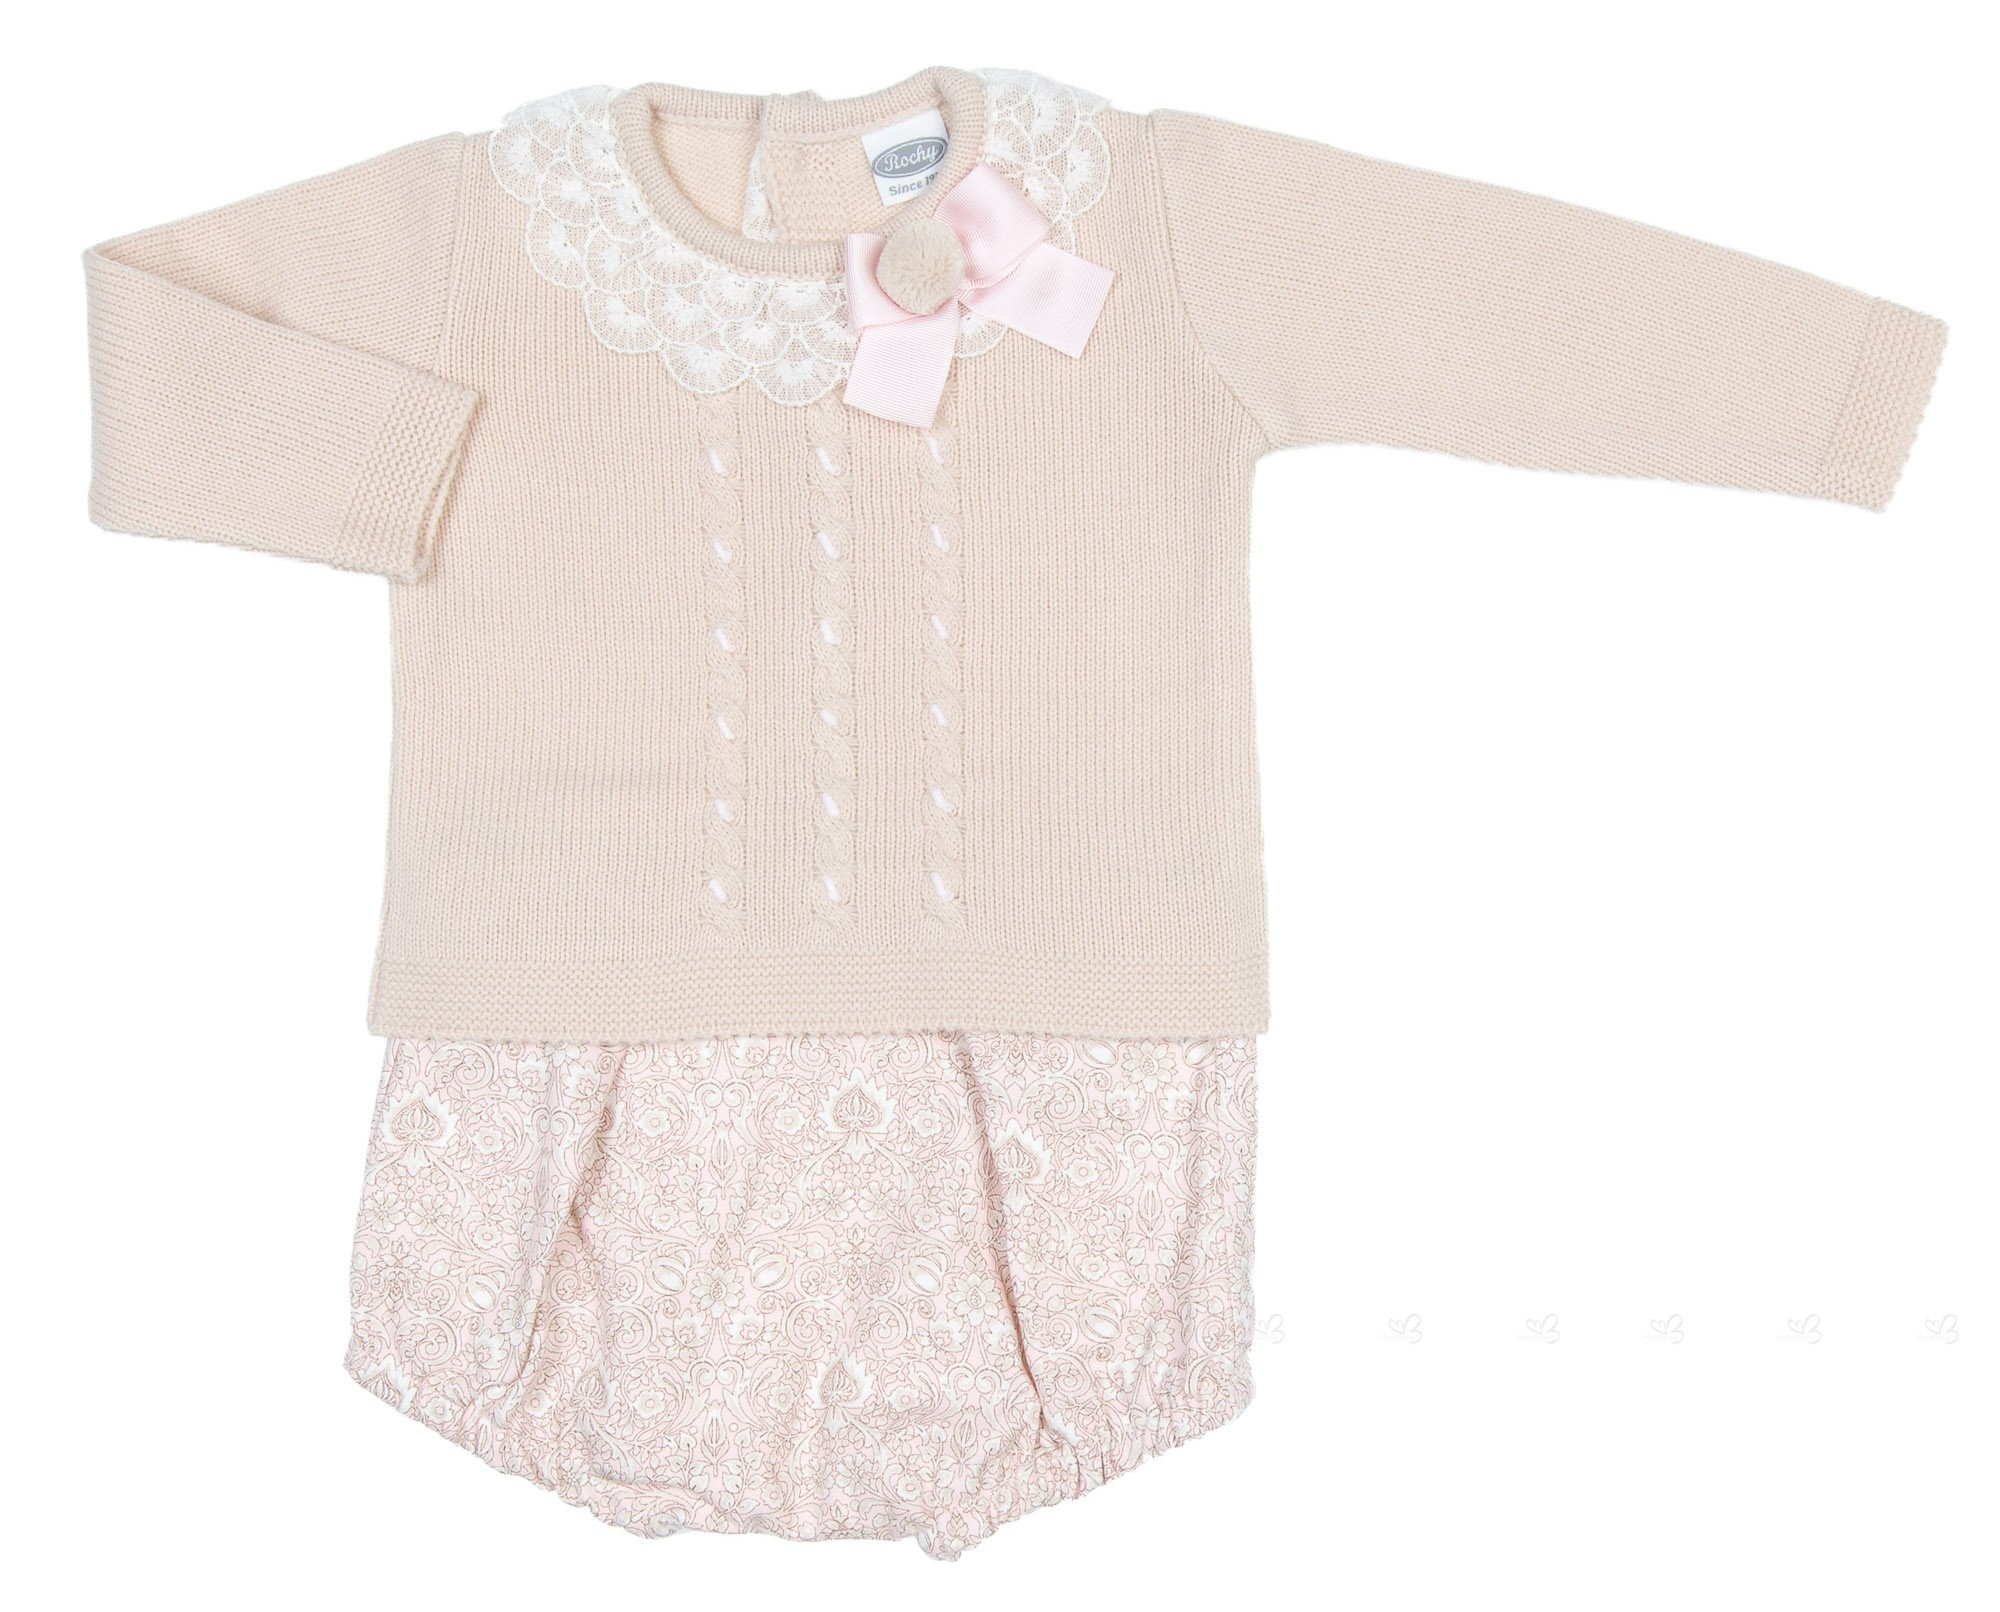 75316e3b8 Baby Beige Pom-Poms Sweater   Pink Floral Short